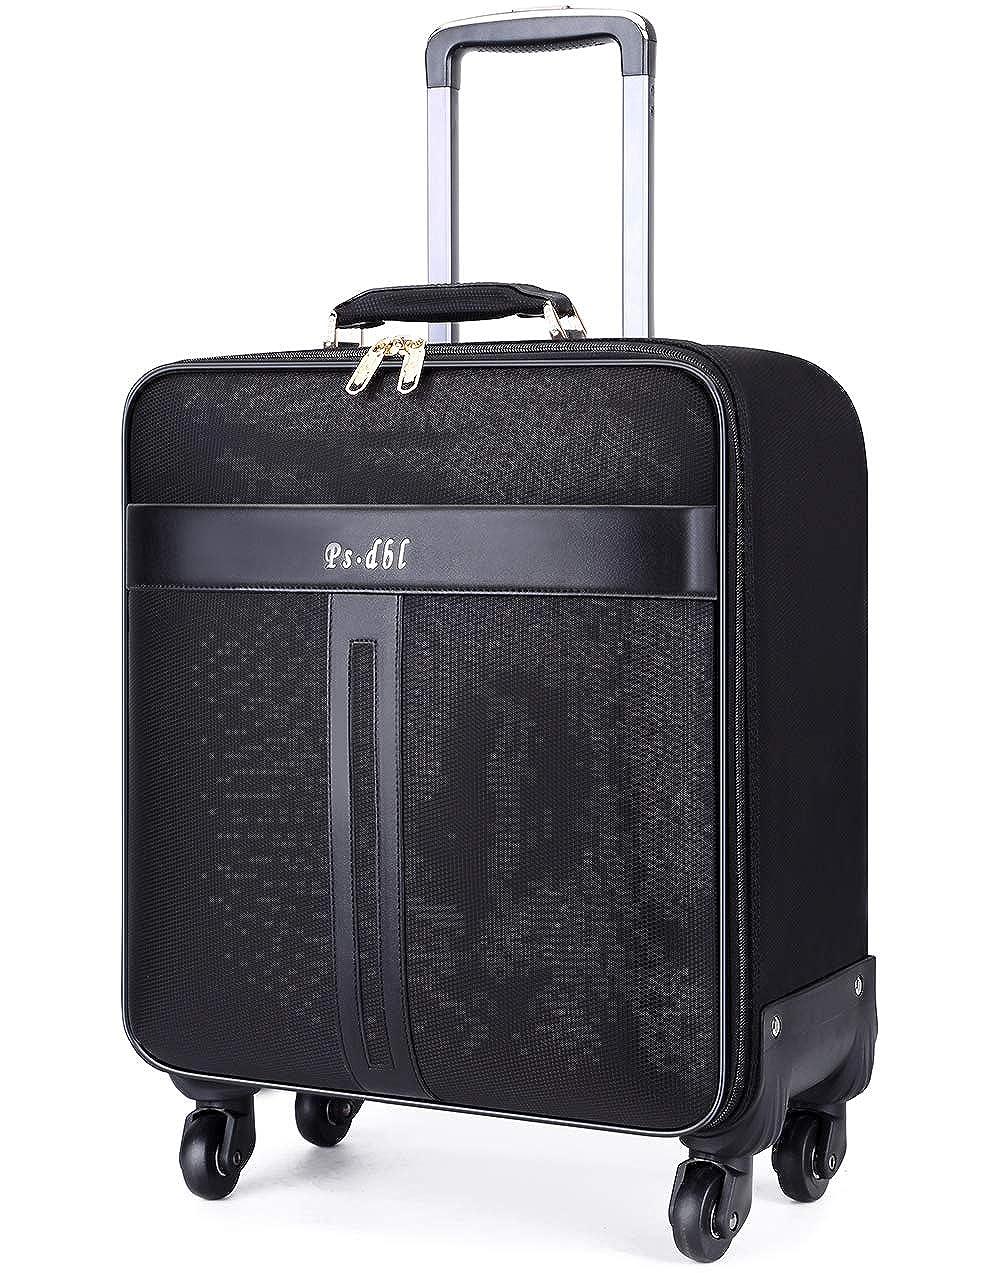 Osonm 防水耐久性オックスフォ一ドスーツケース トラベルバック 機内持ち込みスーツケース パソコンバック キャスター 旅行 出張 横型P2397 37*21*46.5 ブラック B07GVRB79J